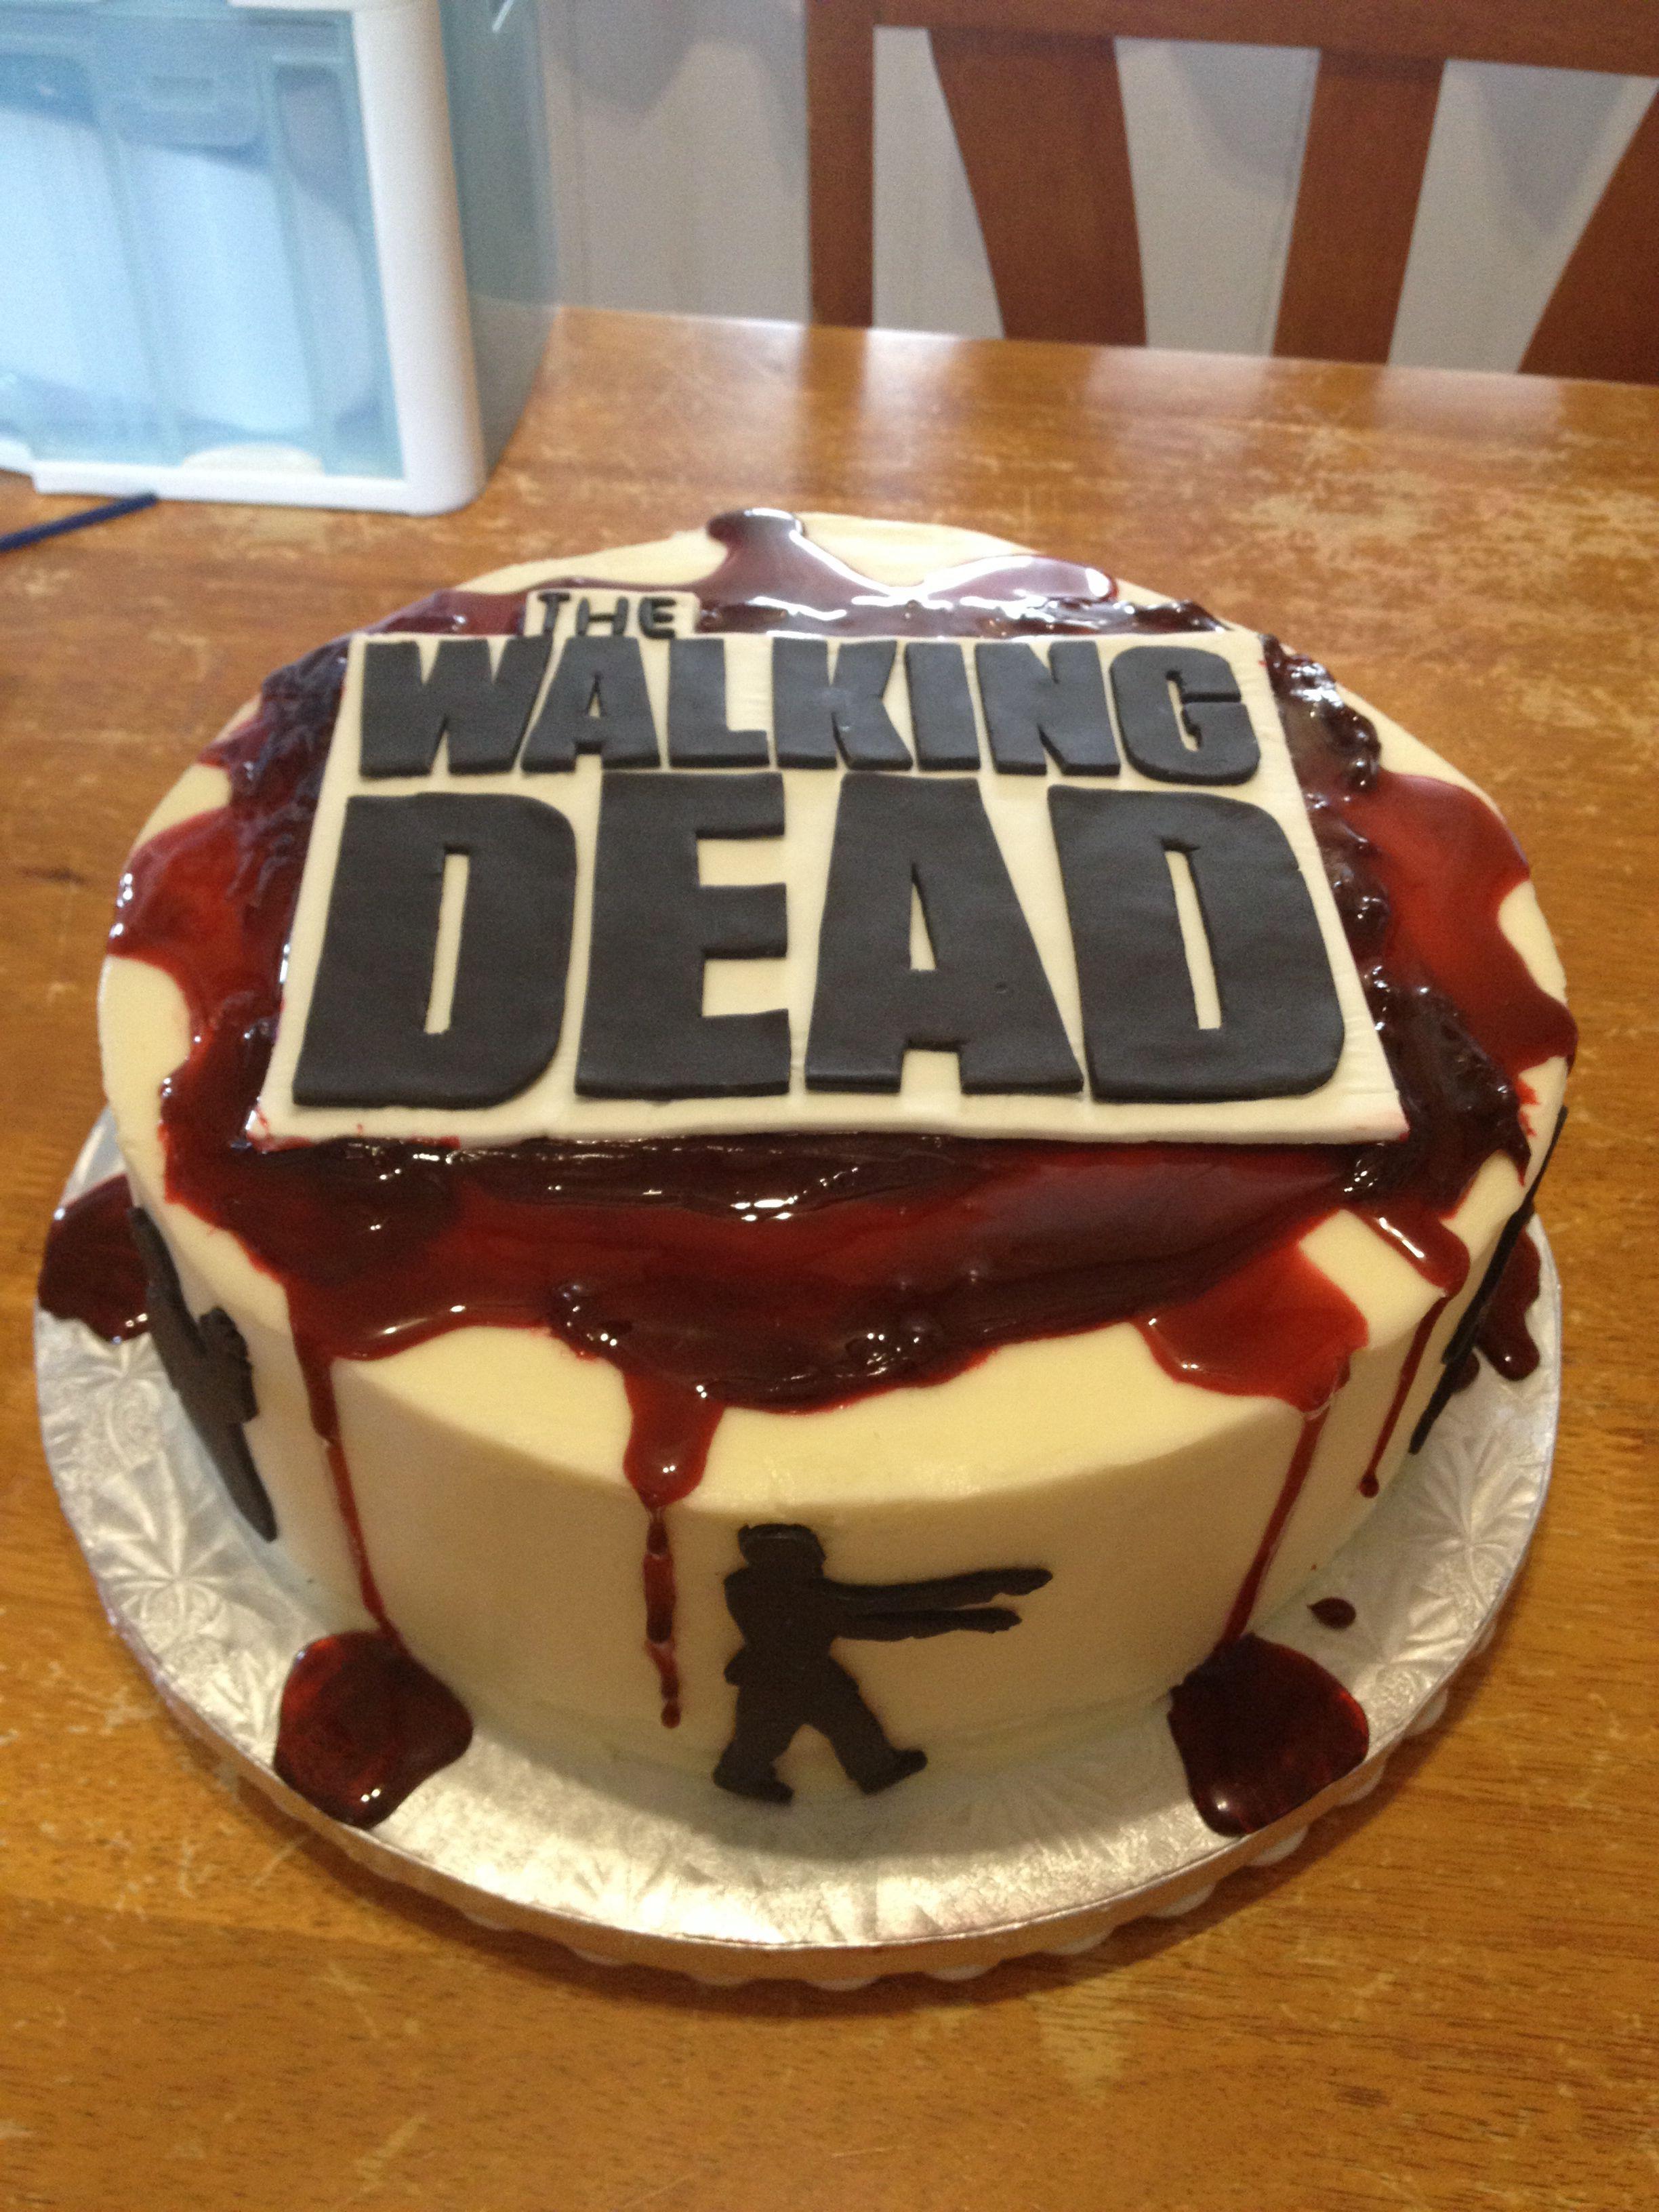 The Walking Dead Cake I Made Inspiration From Pinterest Fondant Zombies Buttercream